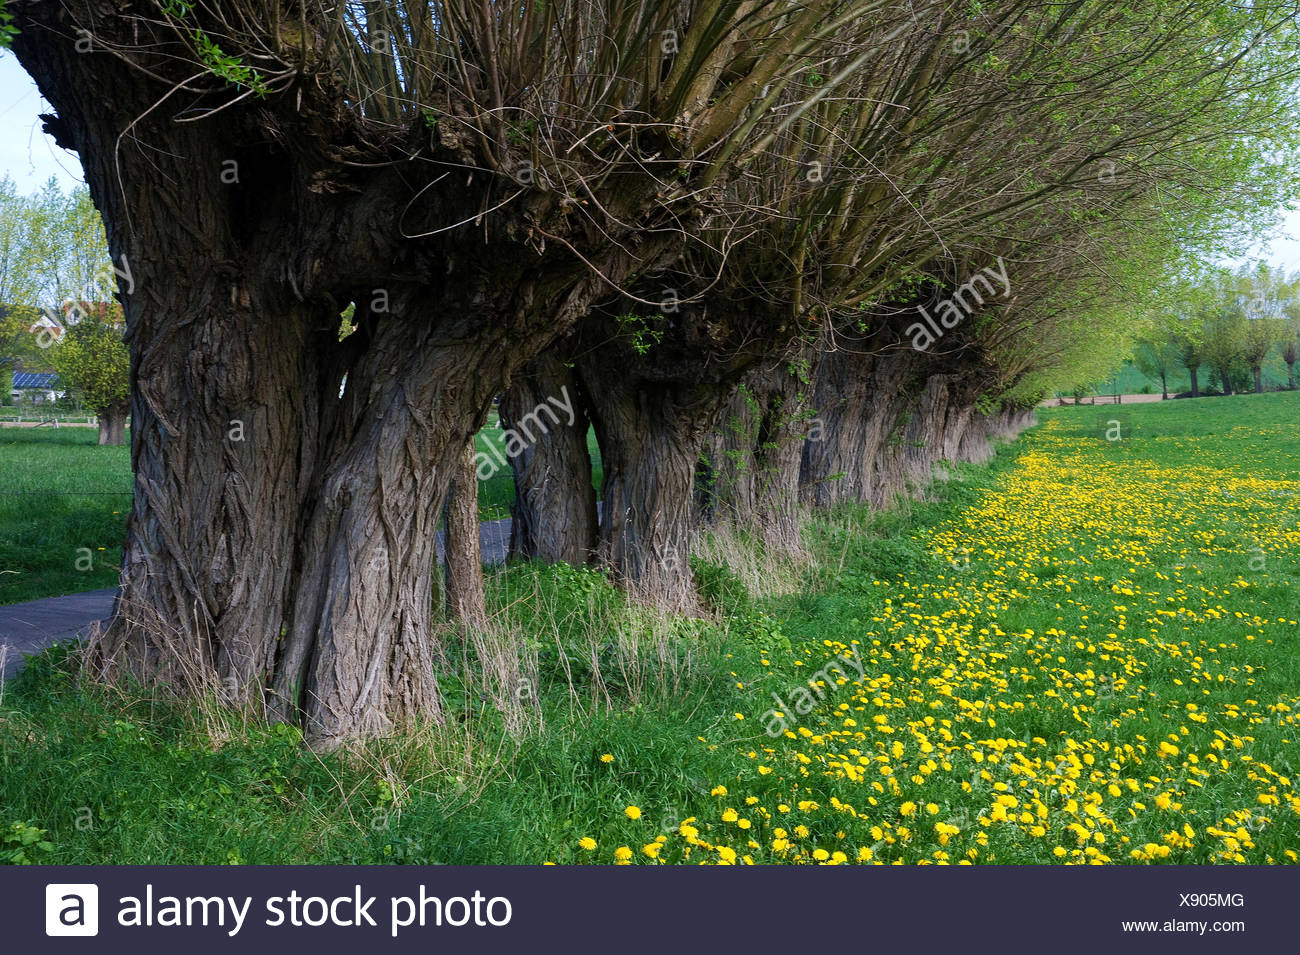 Pollard Willow Trees, near Paderborn, North Rhine-Westphalia, Germany - Stock Image